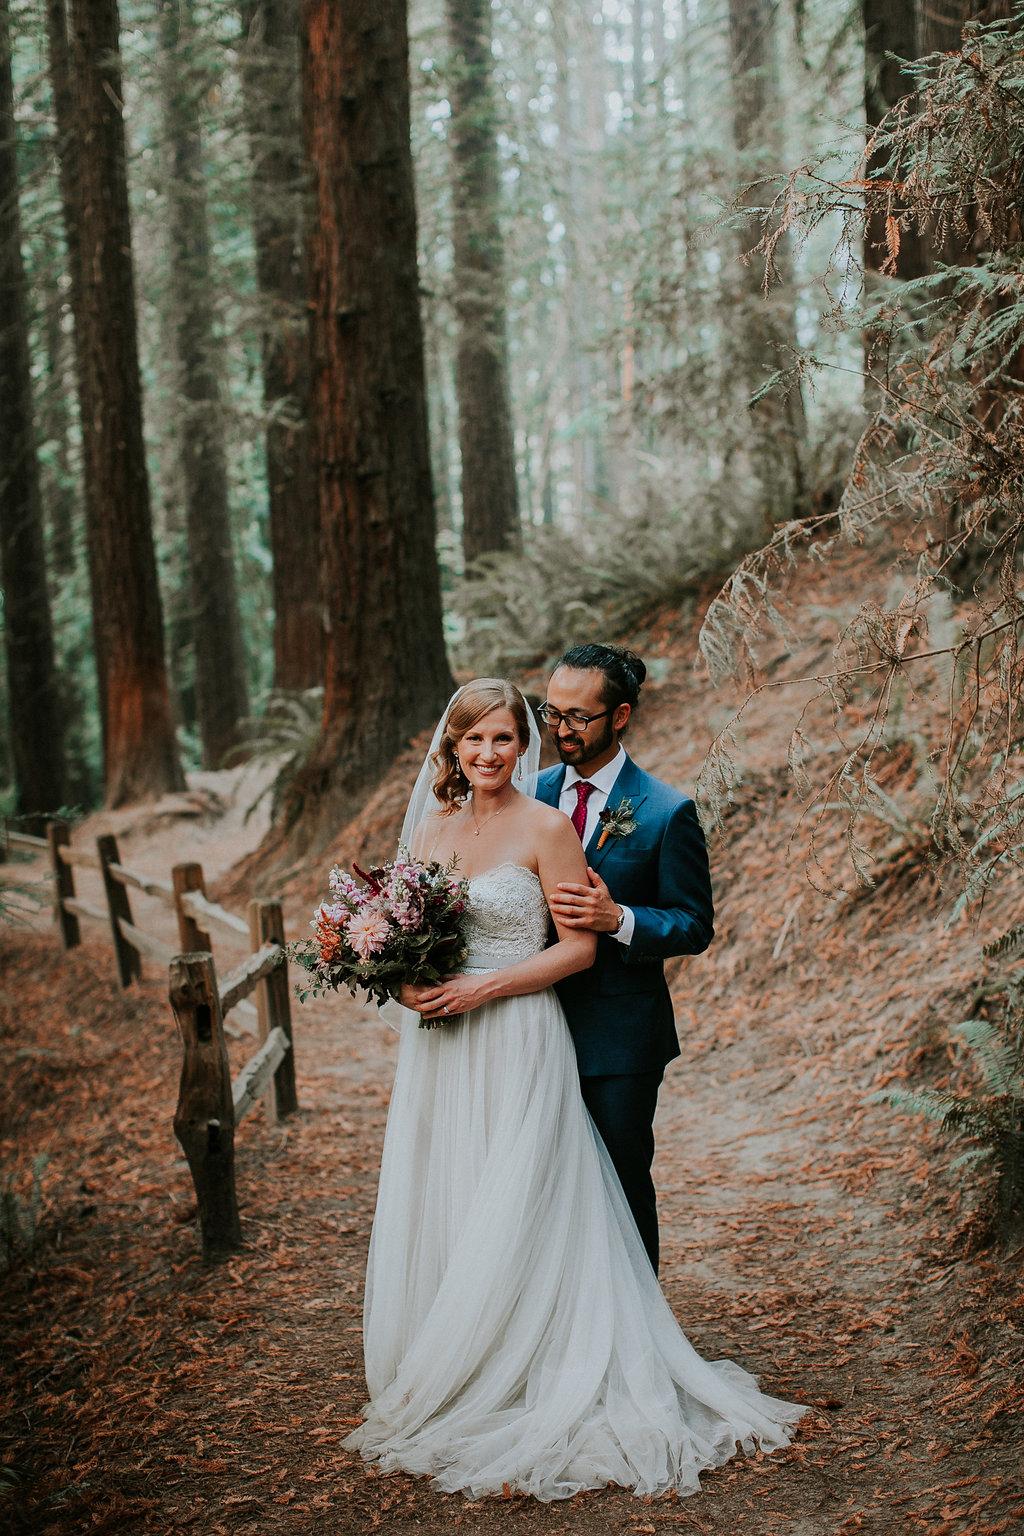 Small wedding at Hoyt Arboretum